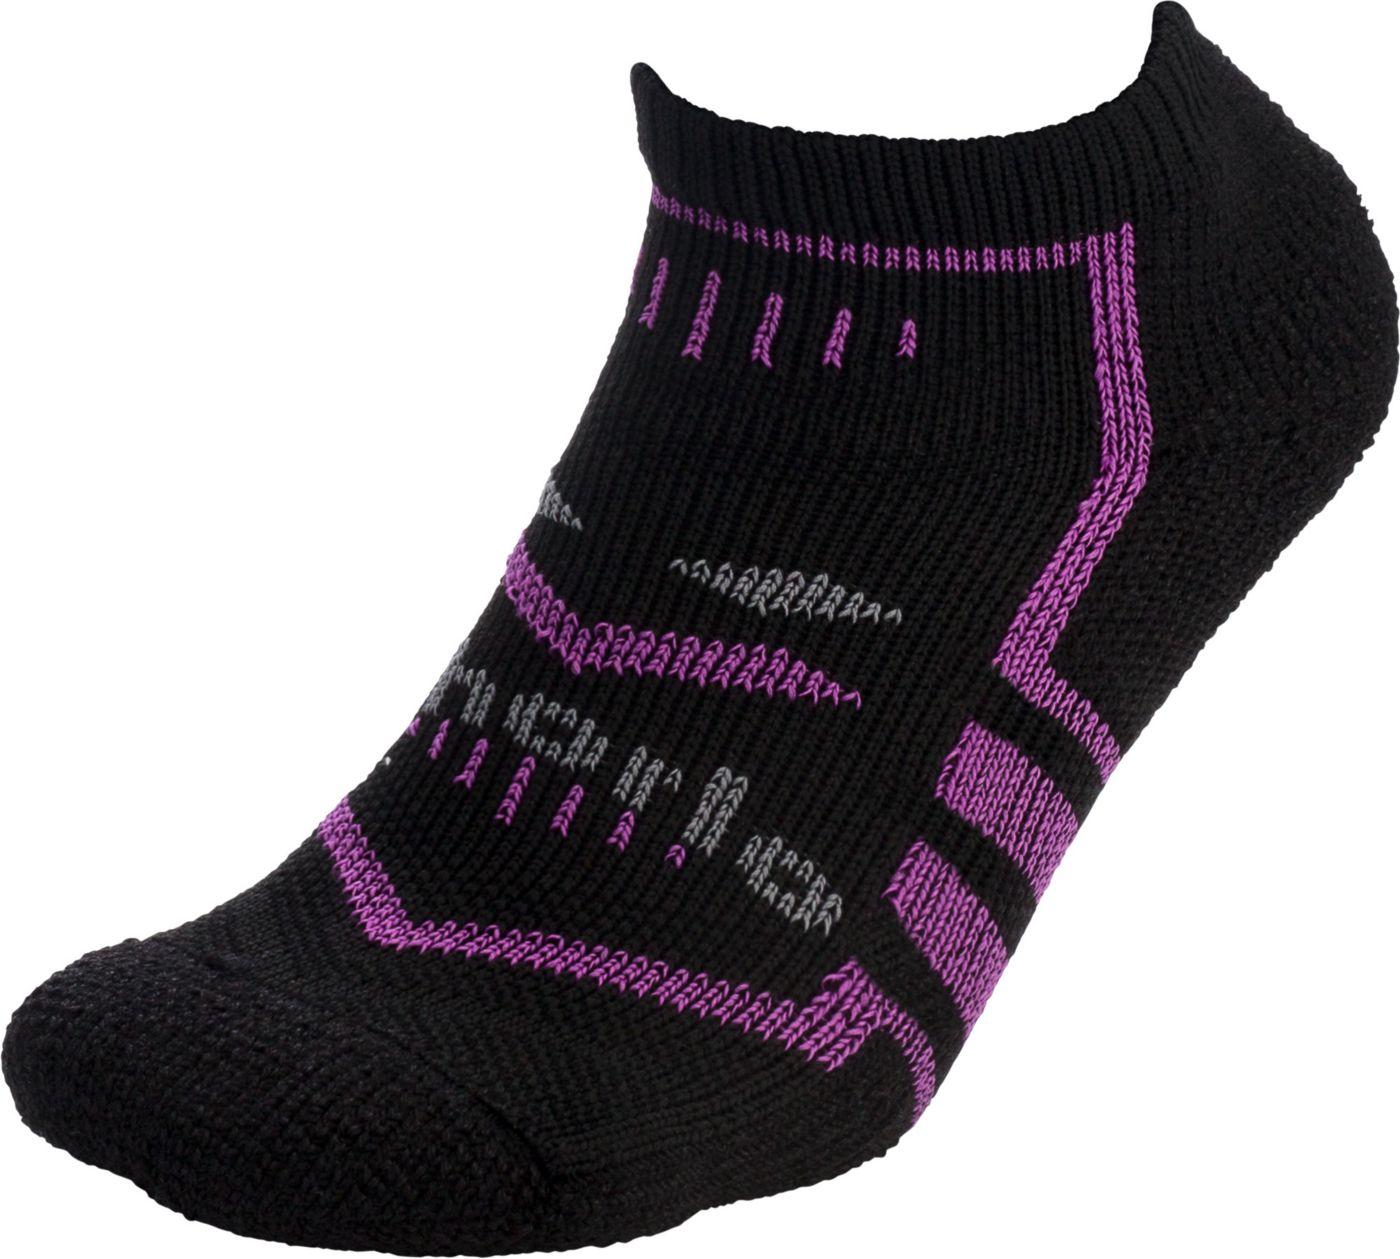 Thor-Lo Edge Low Cut Socks